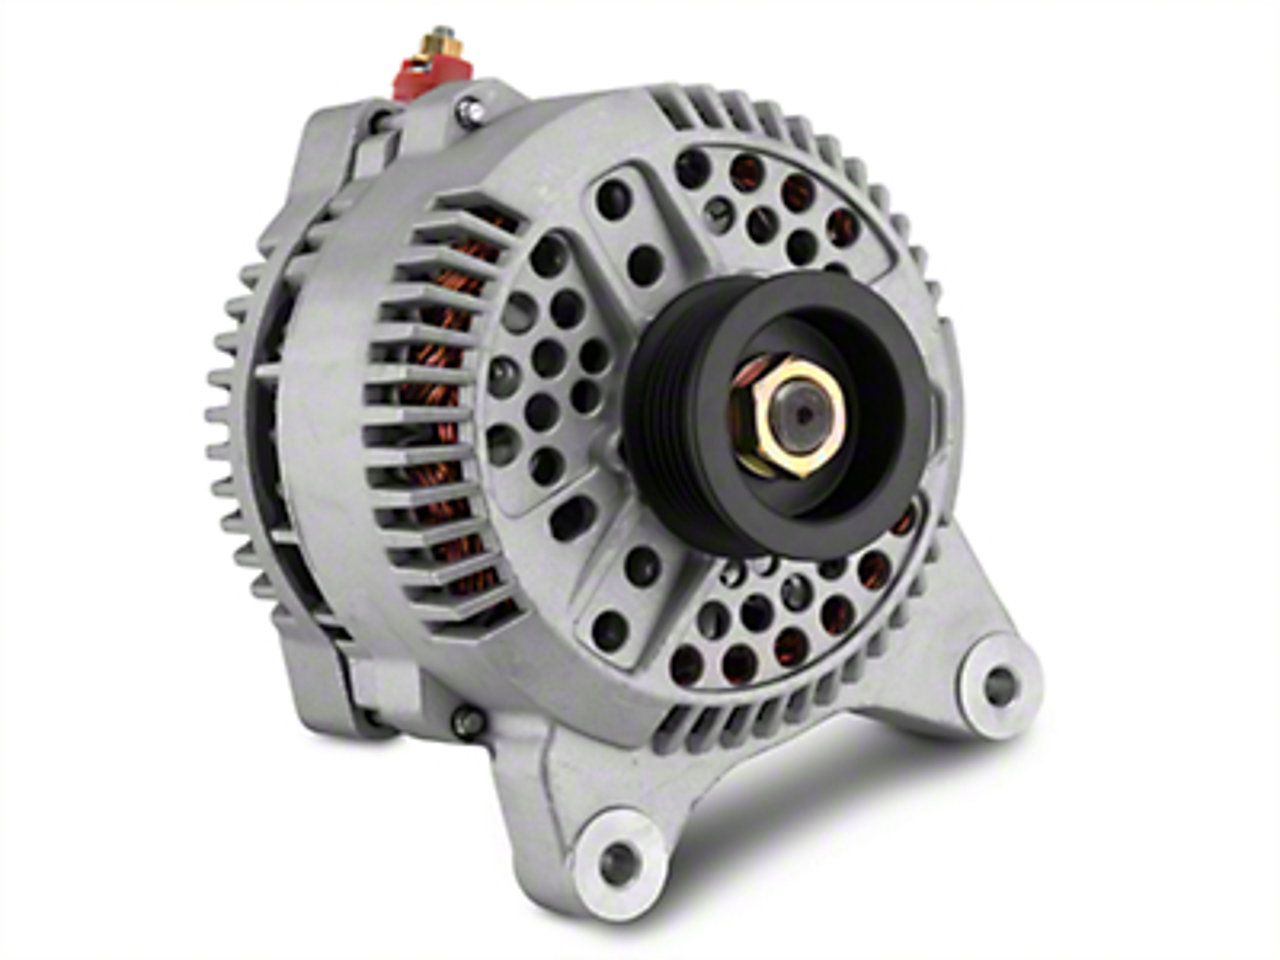 PA Performance High Output Alternator - 200 Amp (97-Mid 03 4.6L F-150; 97-03 5.4L F-150)